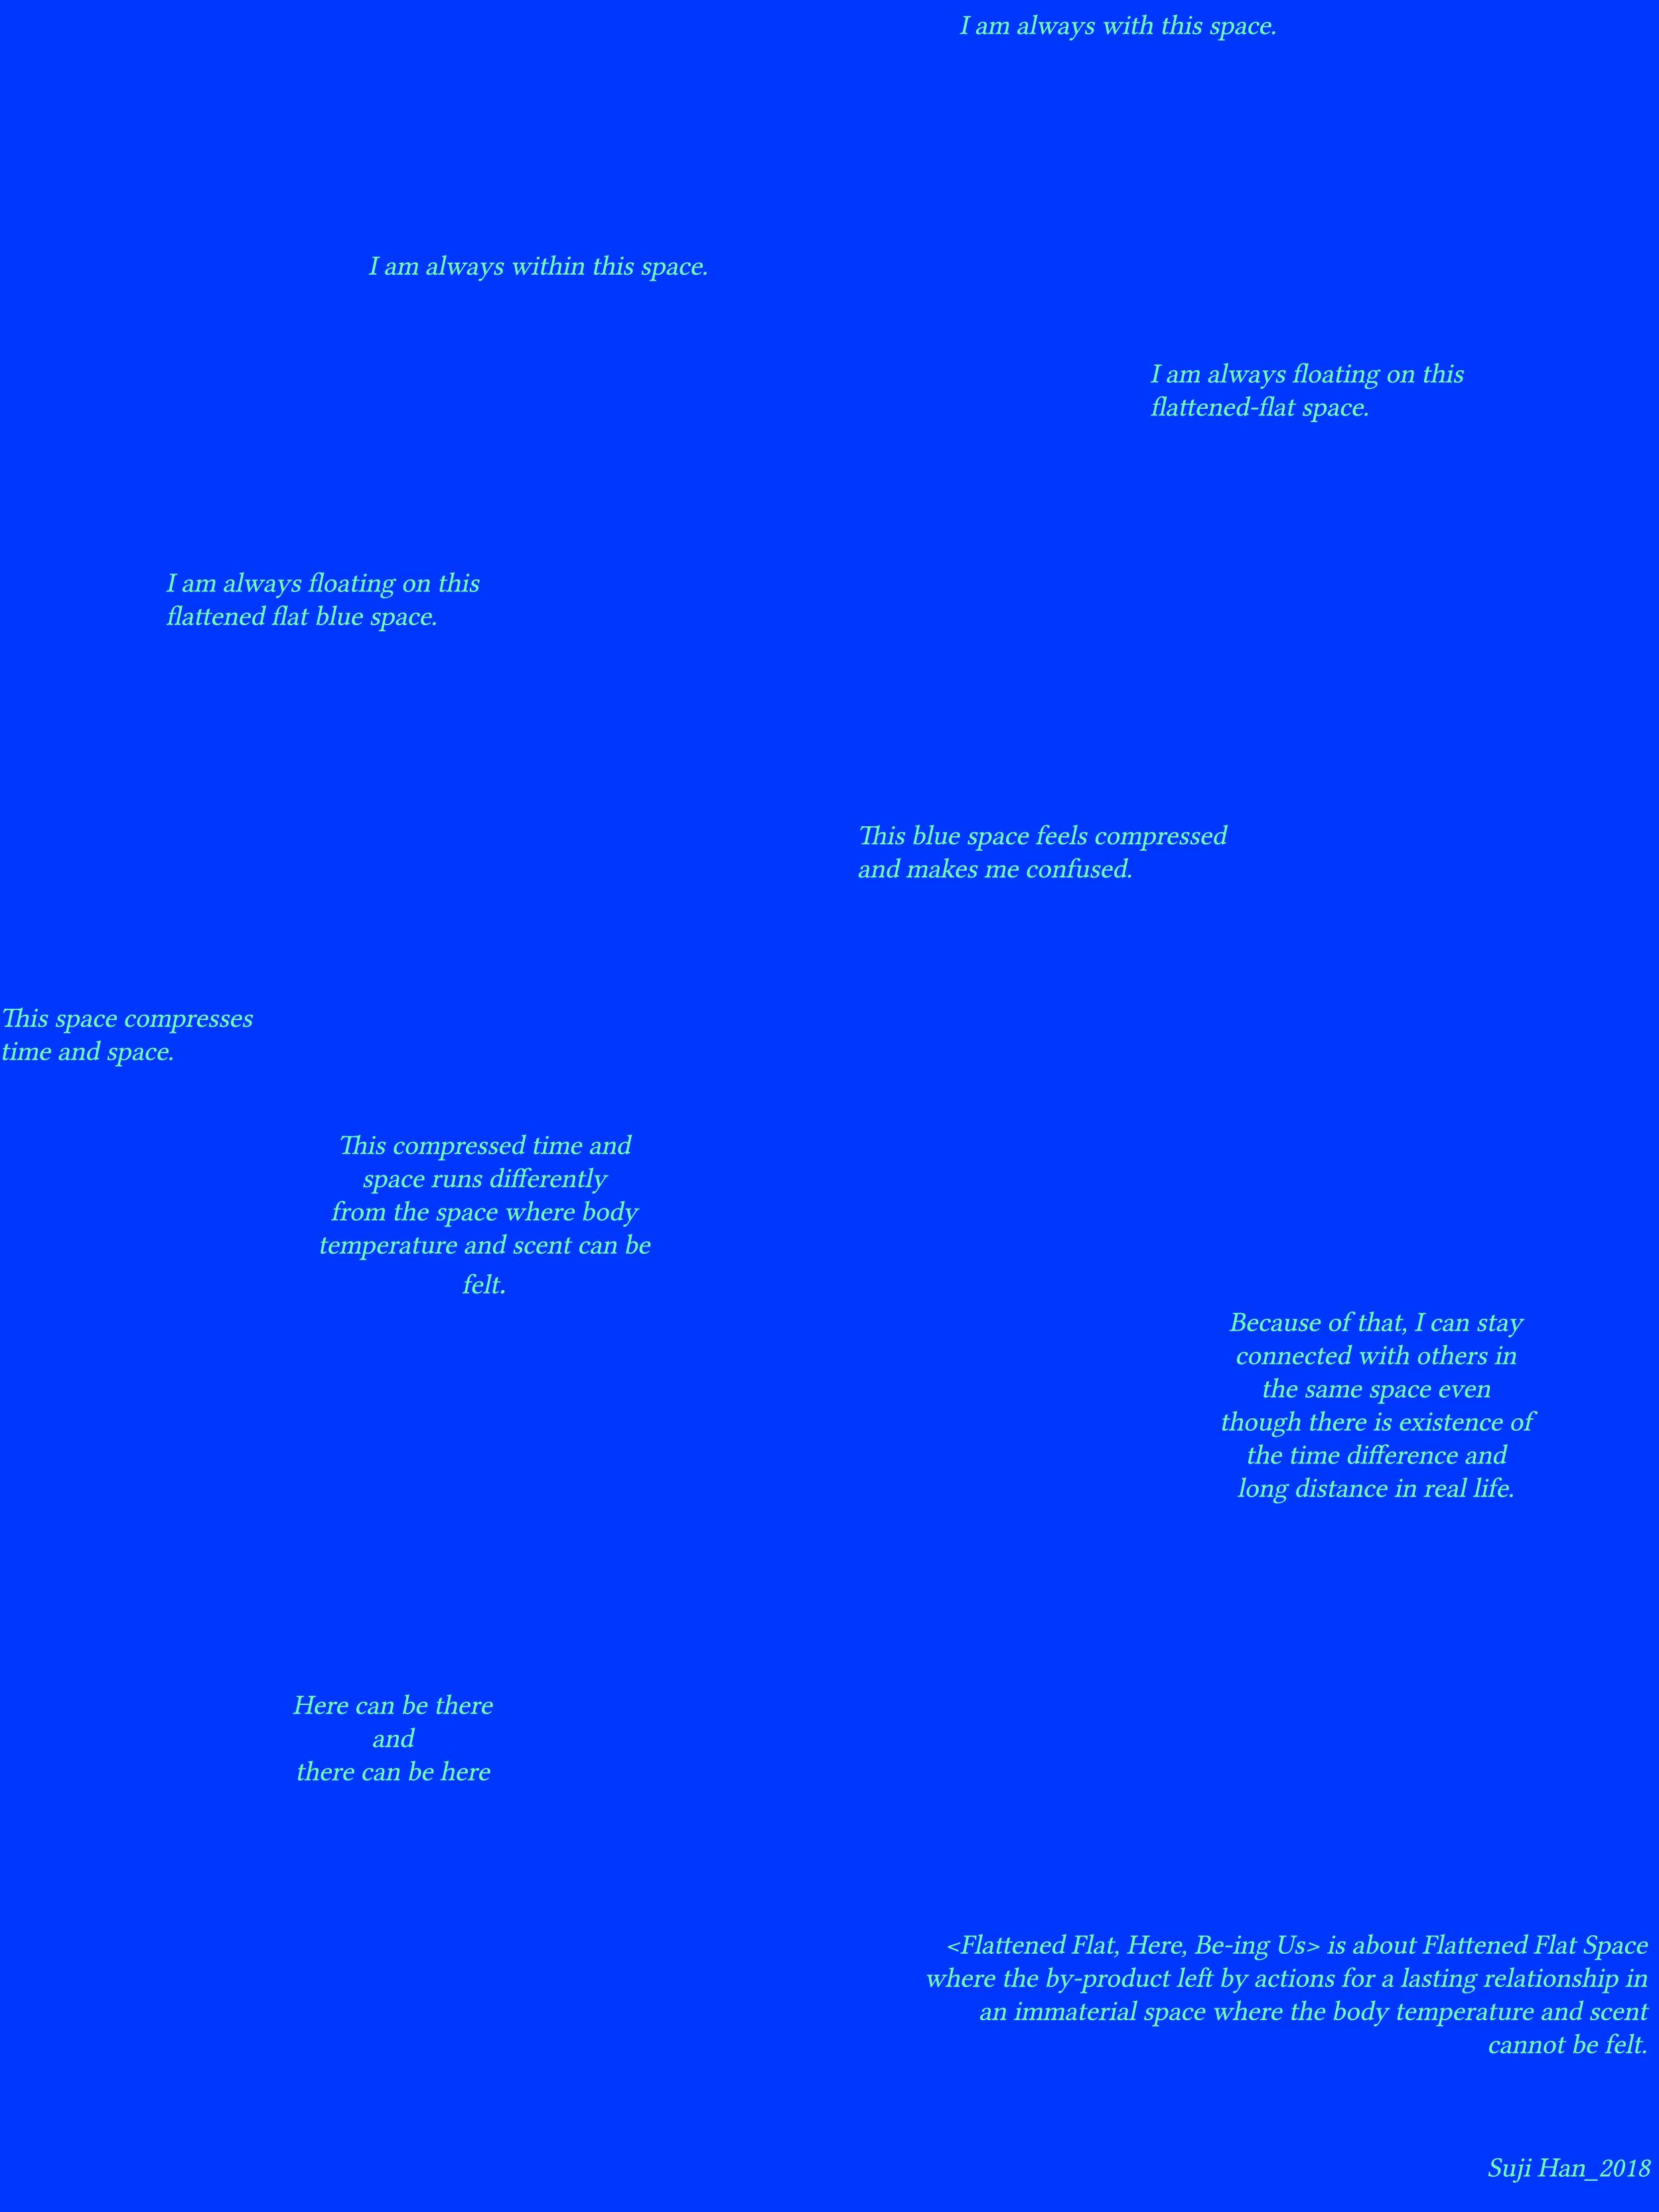 online solo show-01_FLNAL-01.jpg